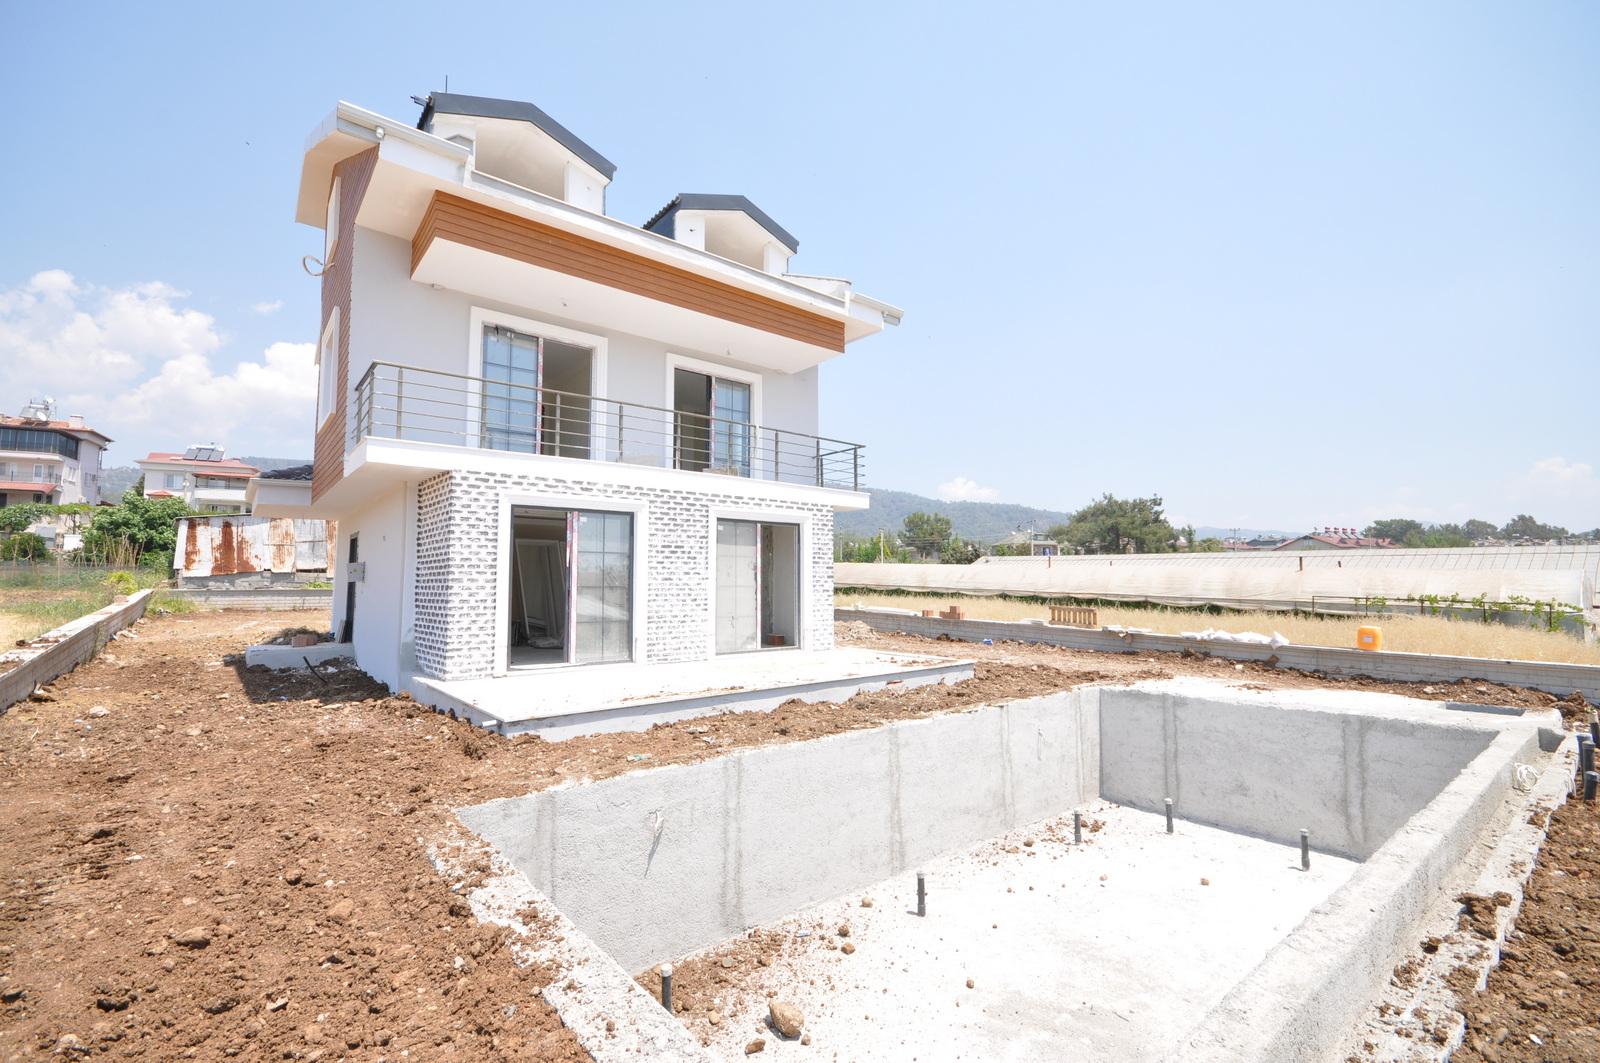 New Build Well Presented 4 Bedroom Villas in Ciftlik